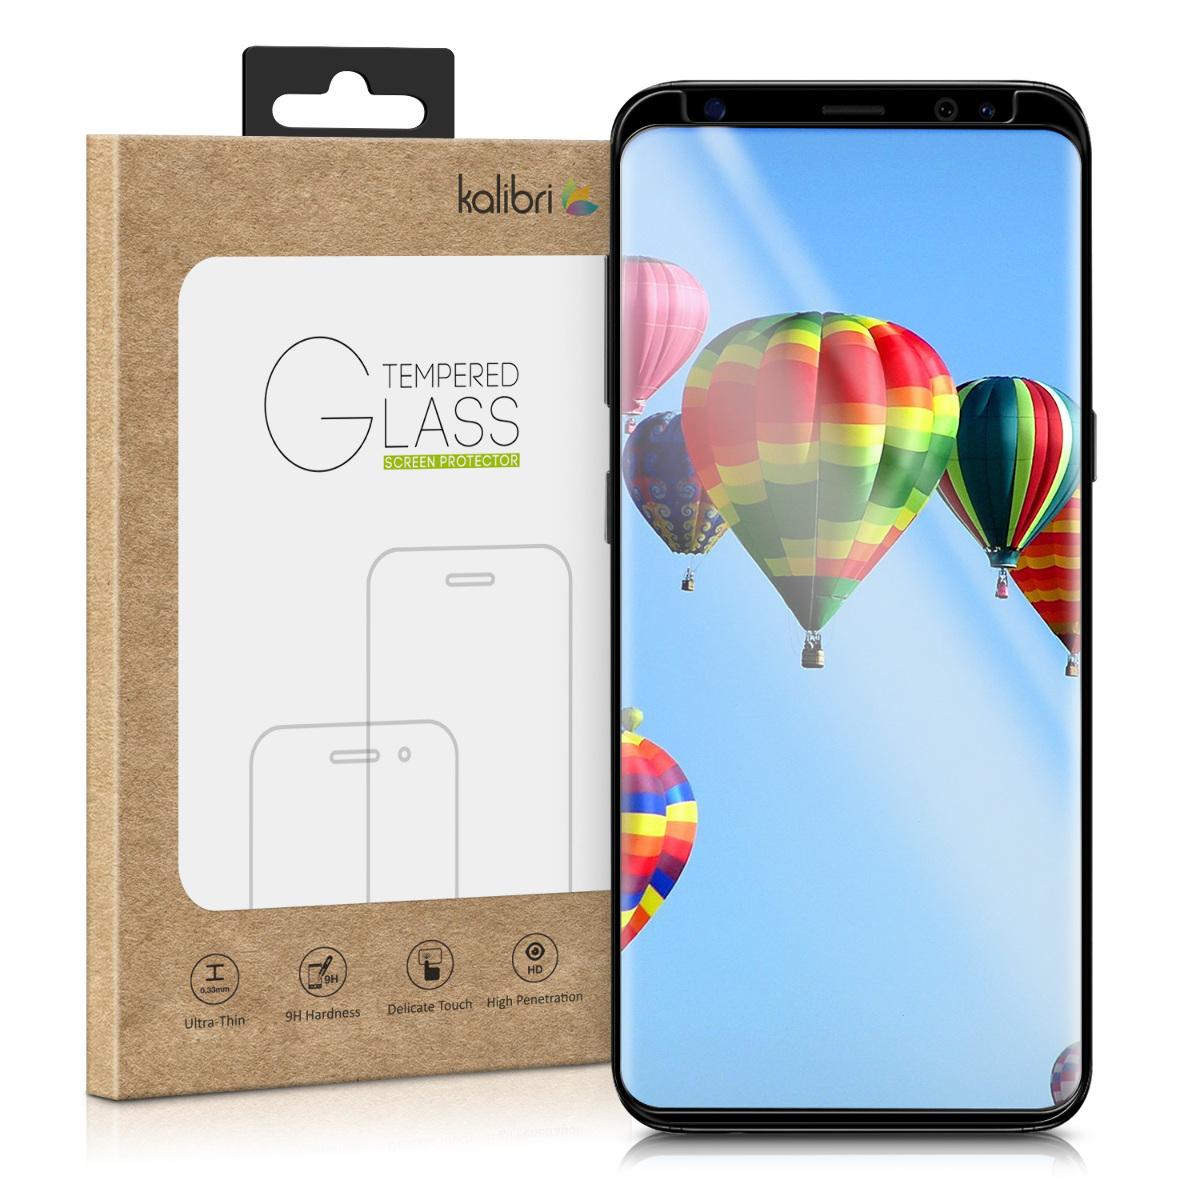 Sklo na display ochranné sklo pro Samsung S9  - Curved Display Film Compatible with Samsung Galaxy S9 - Black Frame